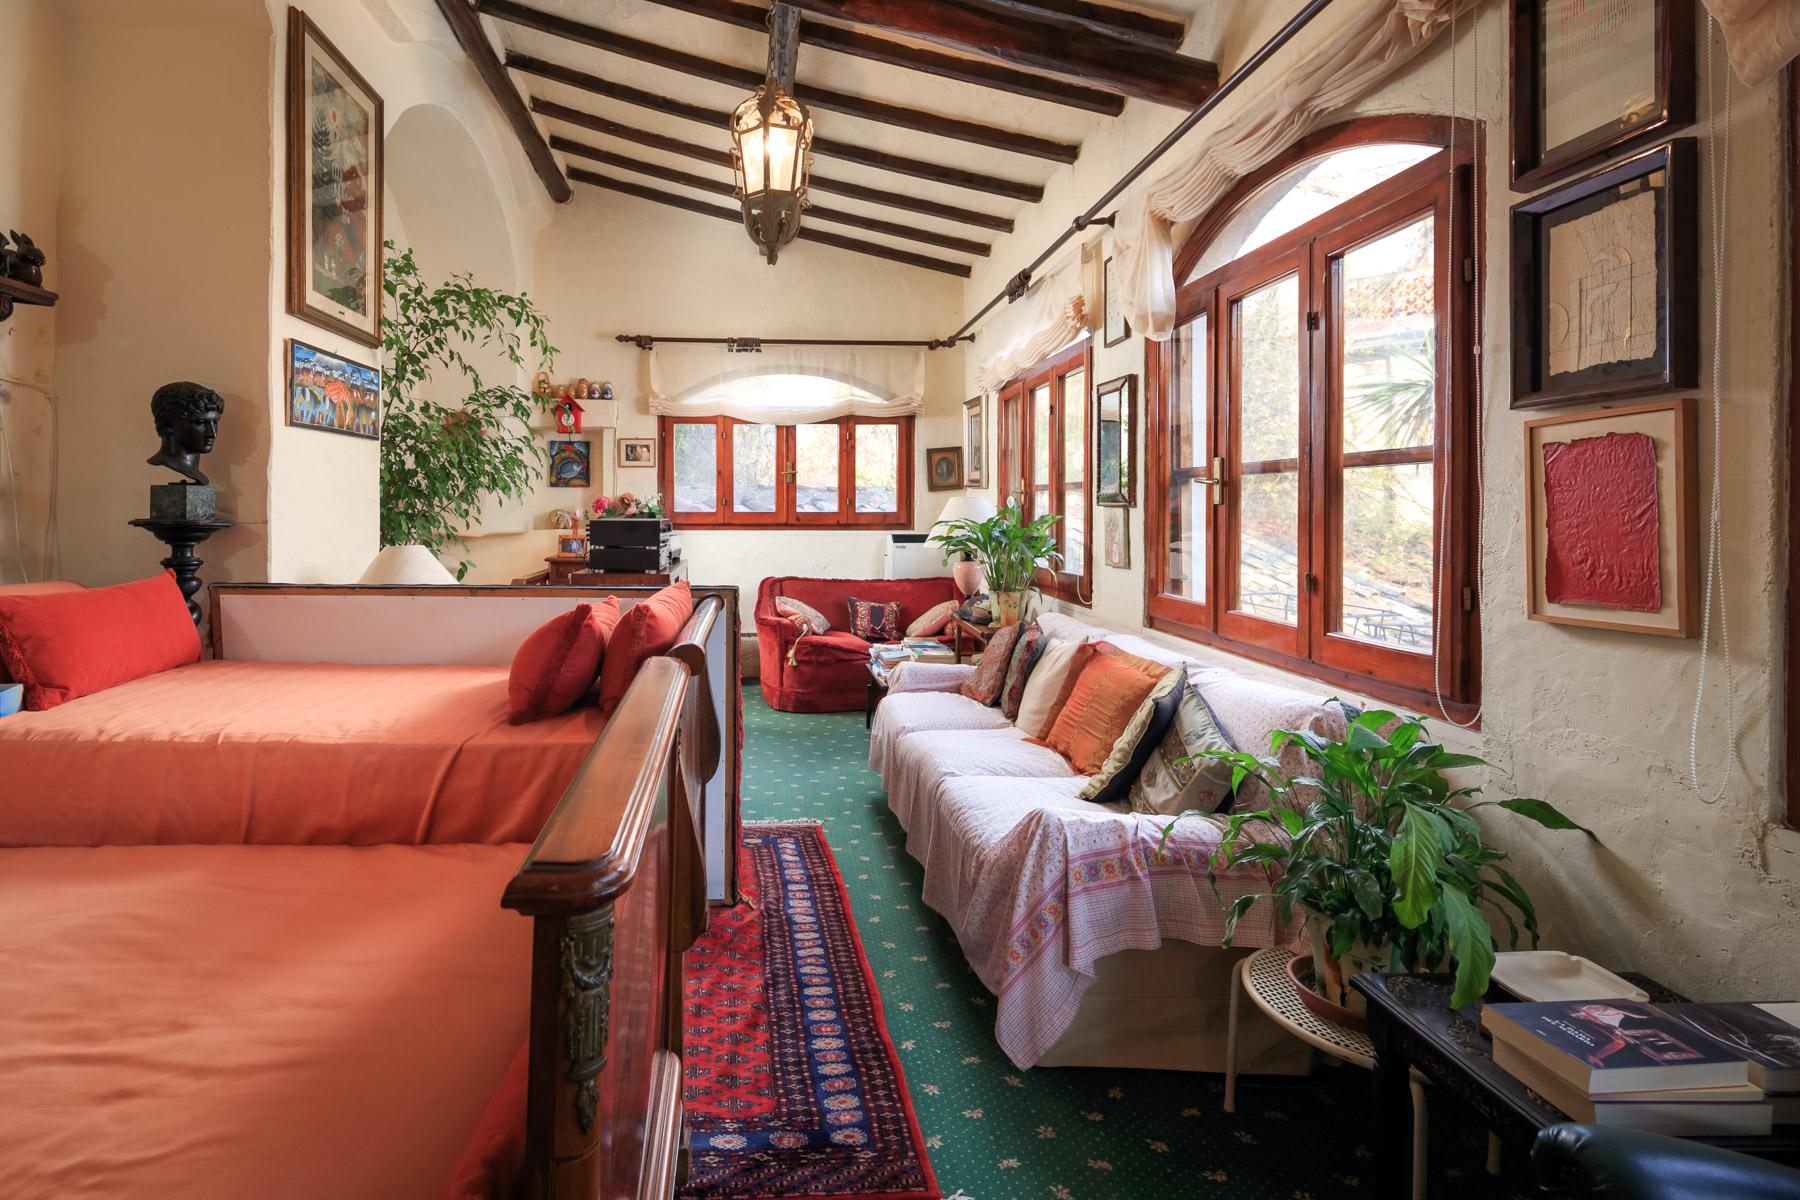 Villa in Vendita a Camaiore: 5 locali, 500 mq - Foto 16